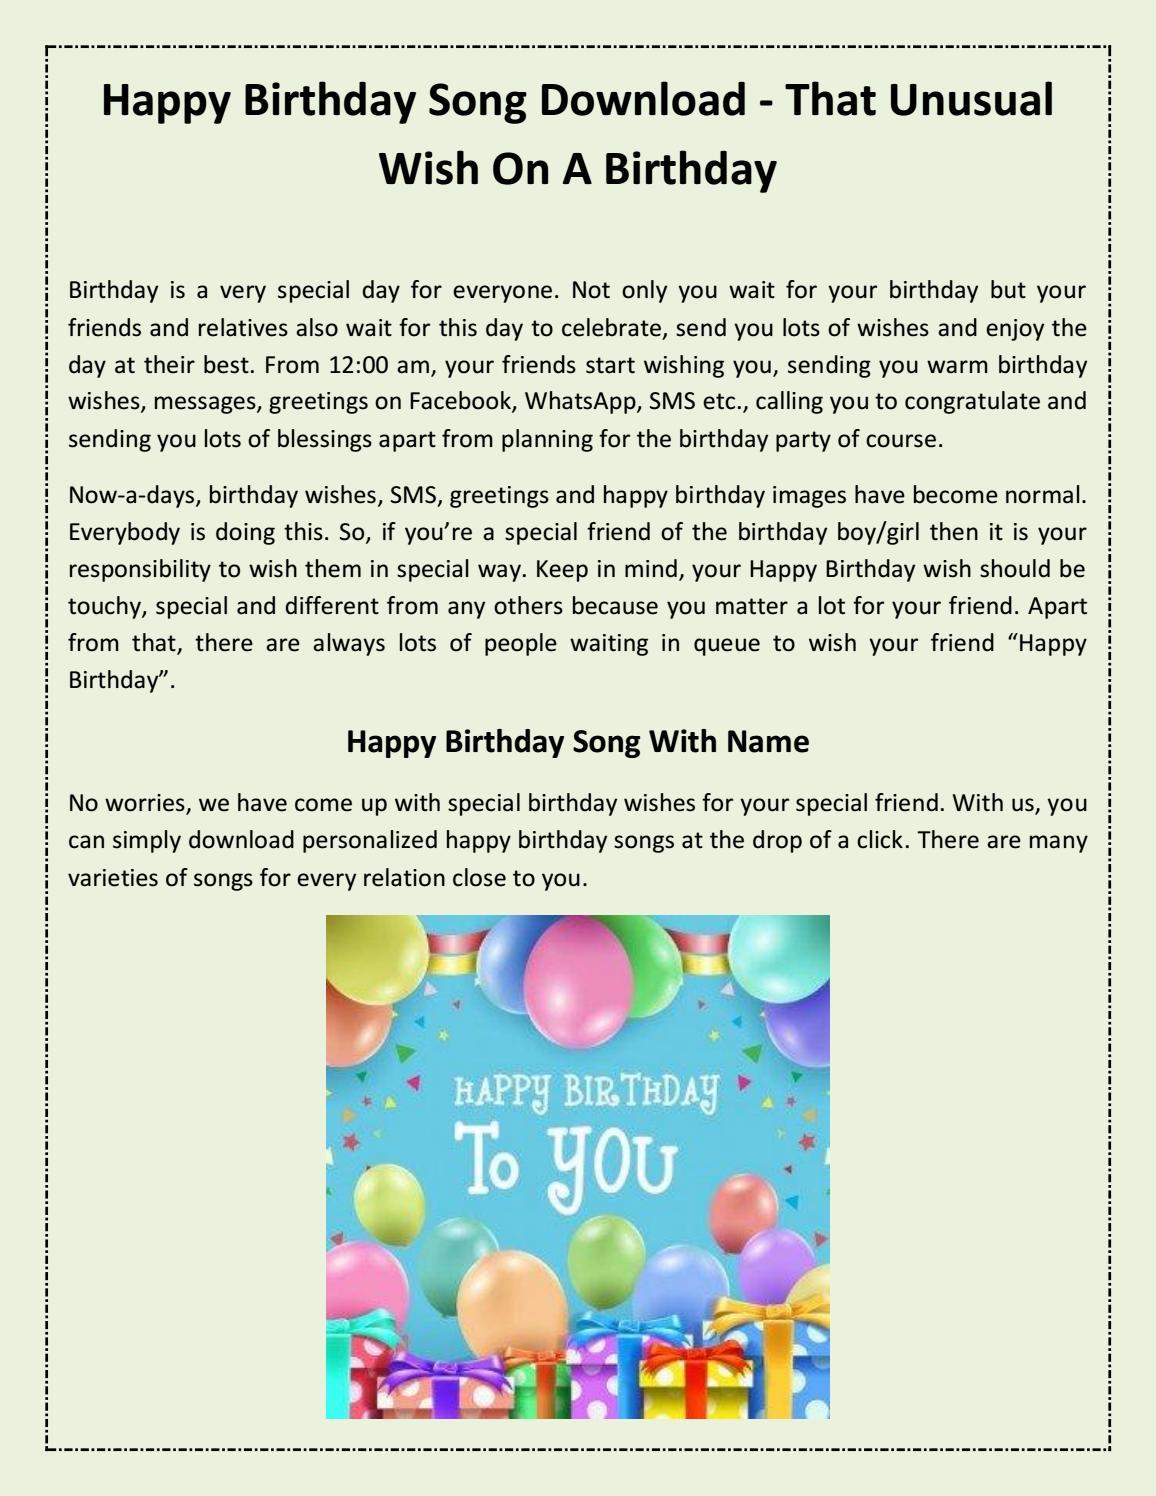 Birthday Wishes For Friend Song Download Birhday song Listen